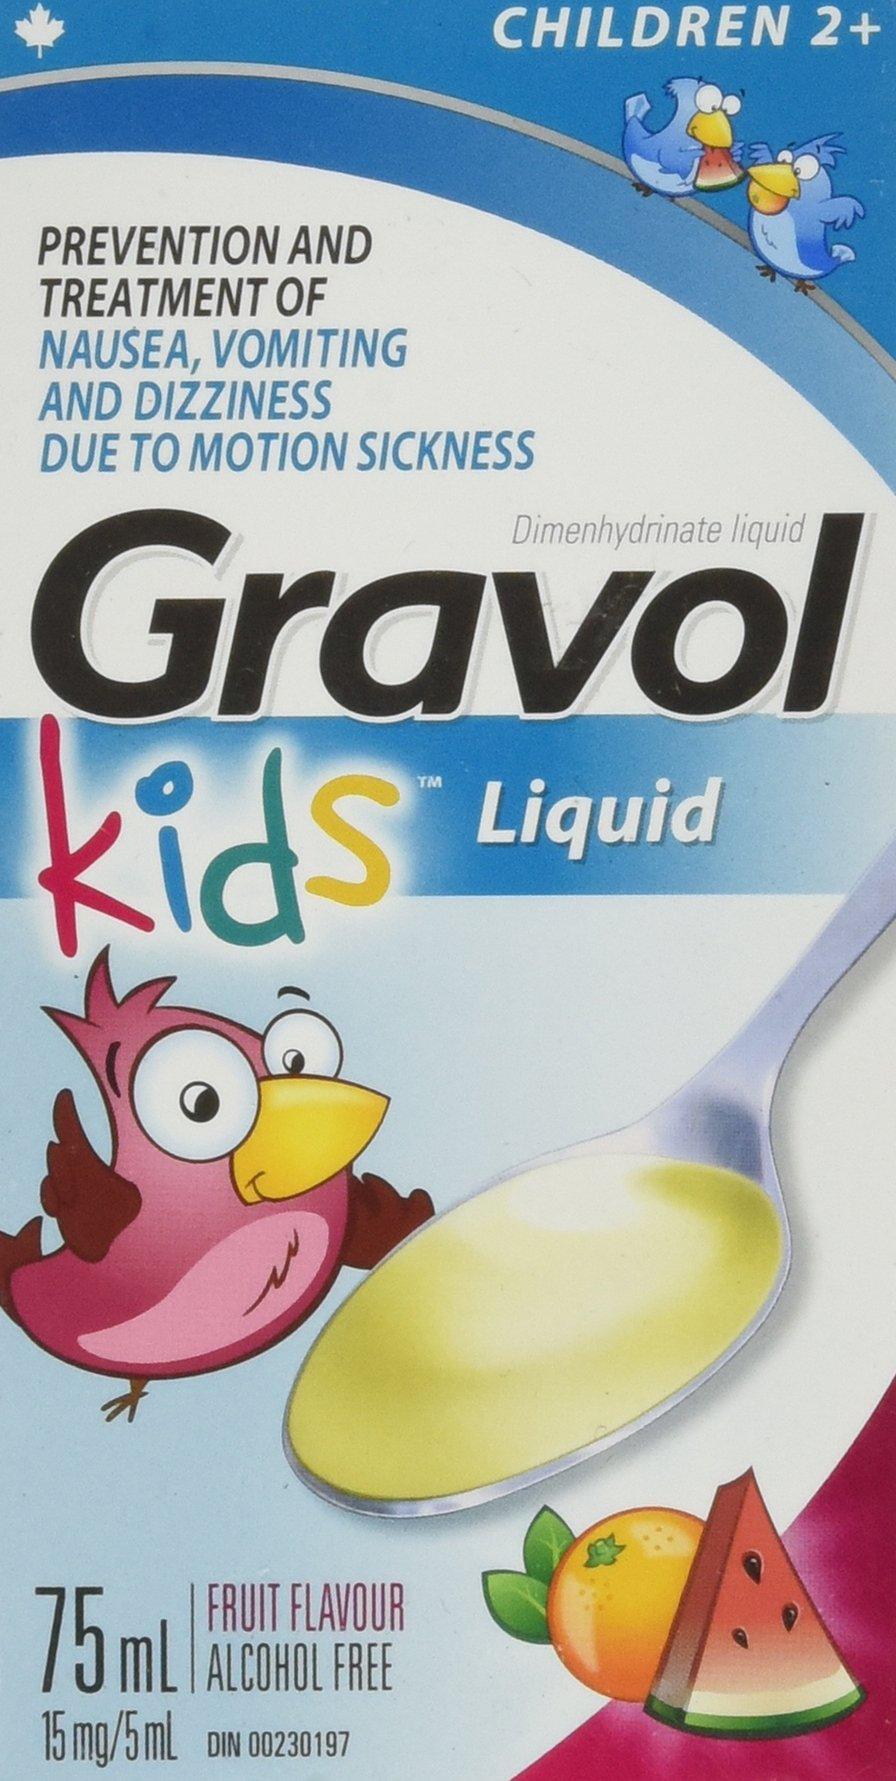 Children's Liquid GRAVOL for NAUSEA, VOMITING, DIZZINESS & MOTION SICKNESS Ages 2+ (75ml size)